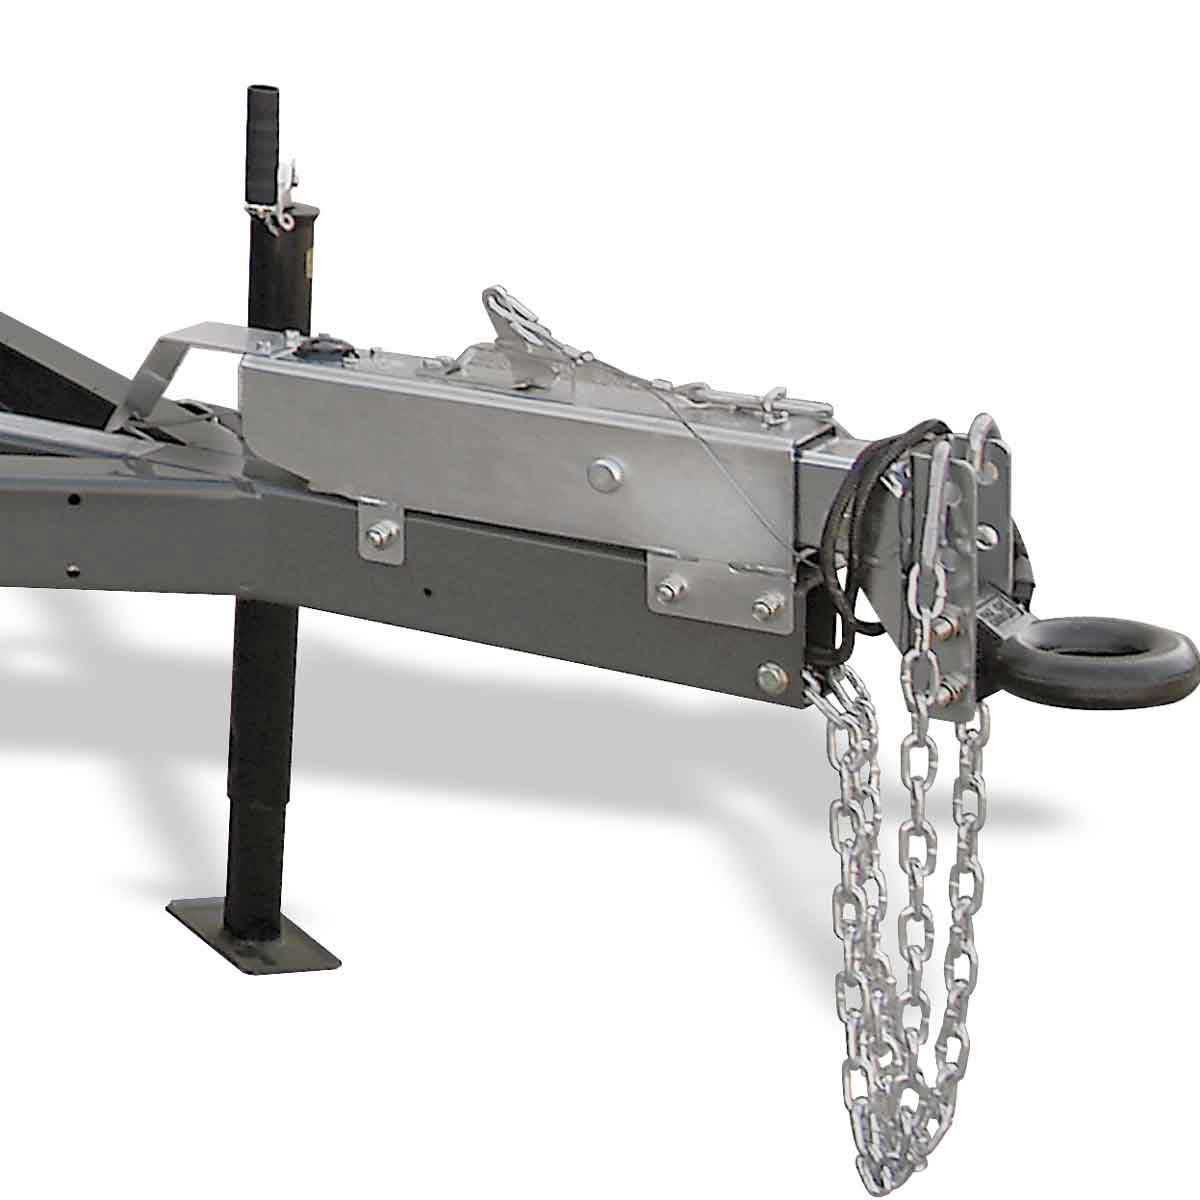 Wacker Neuson mobile generator pintle hitch